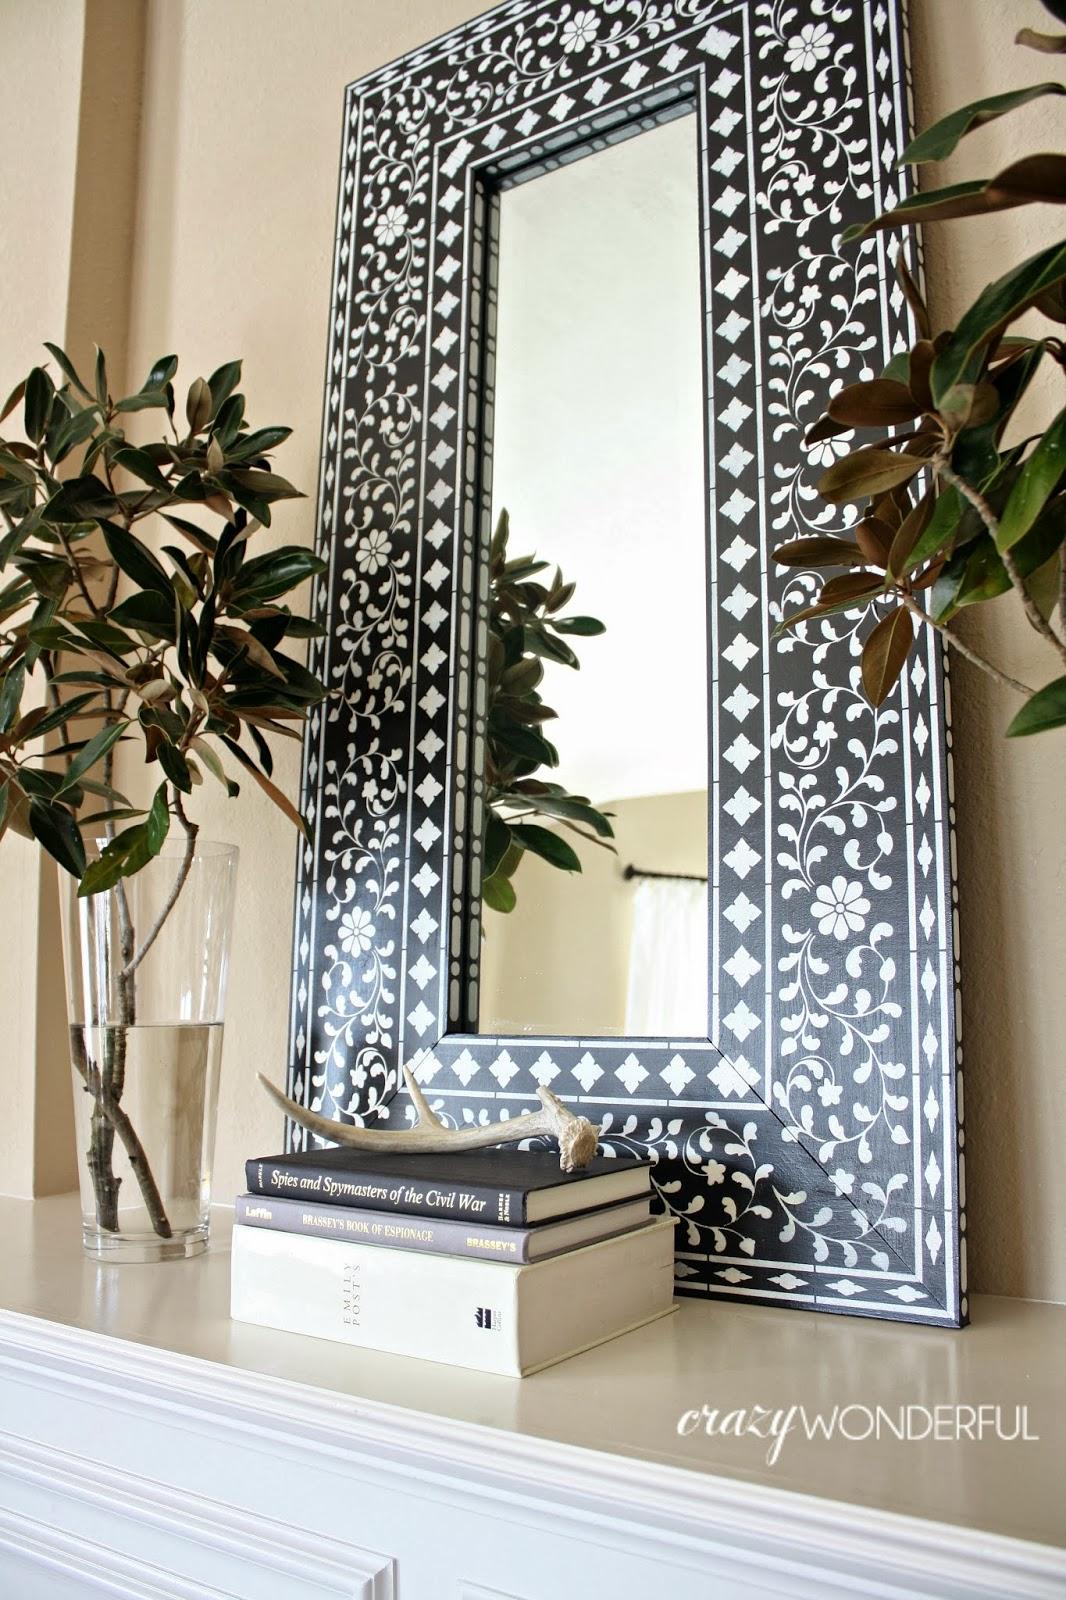 Mirror Decorating Ideas  Fotolipcom Rich image and wallpaper